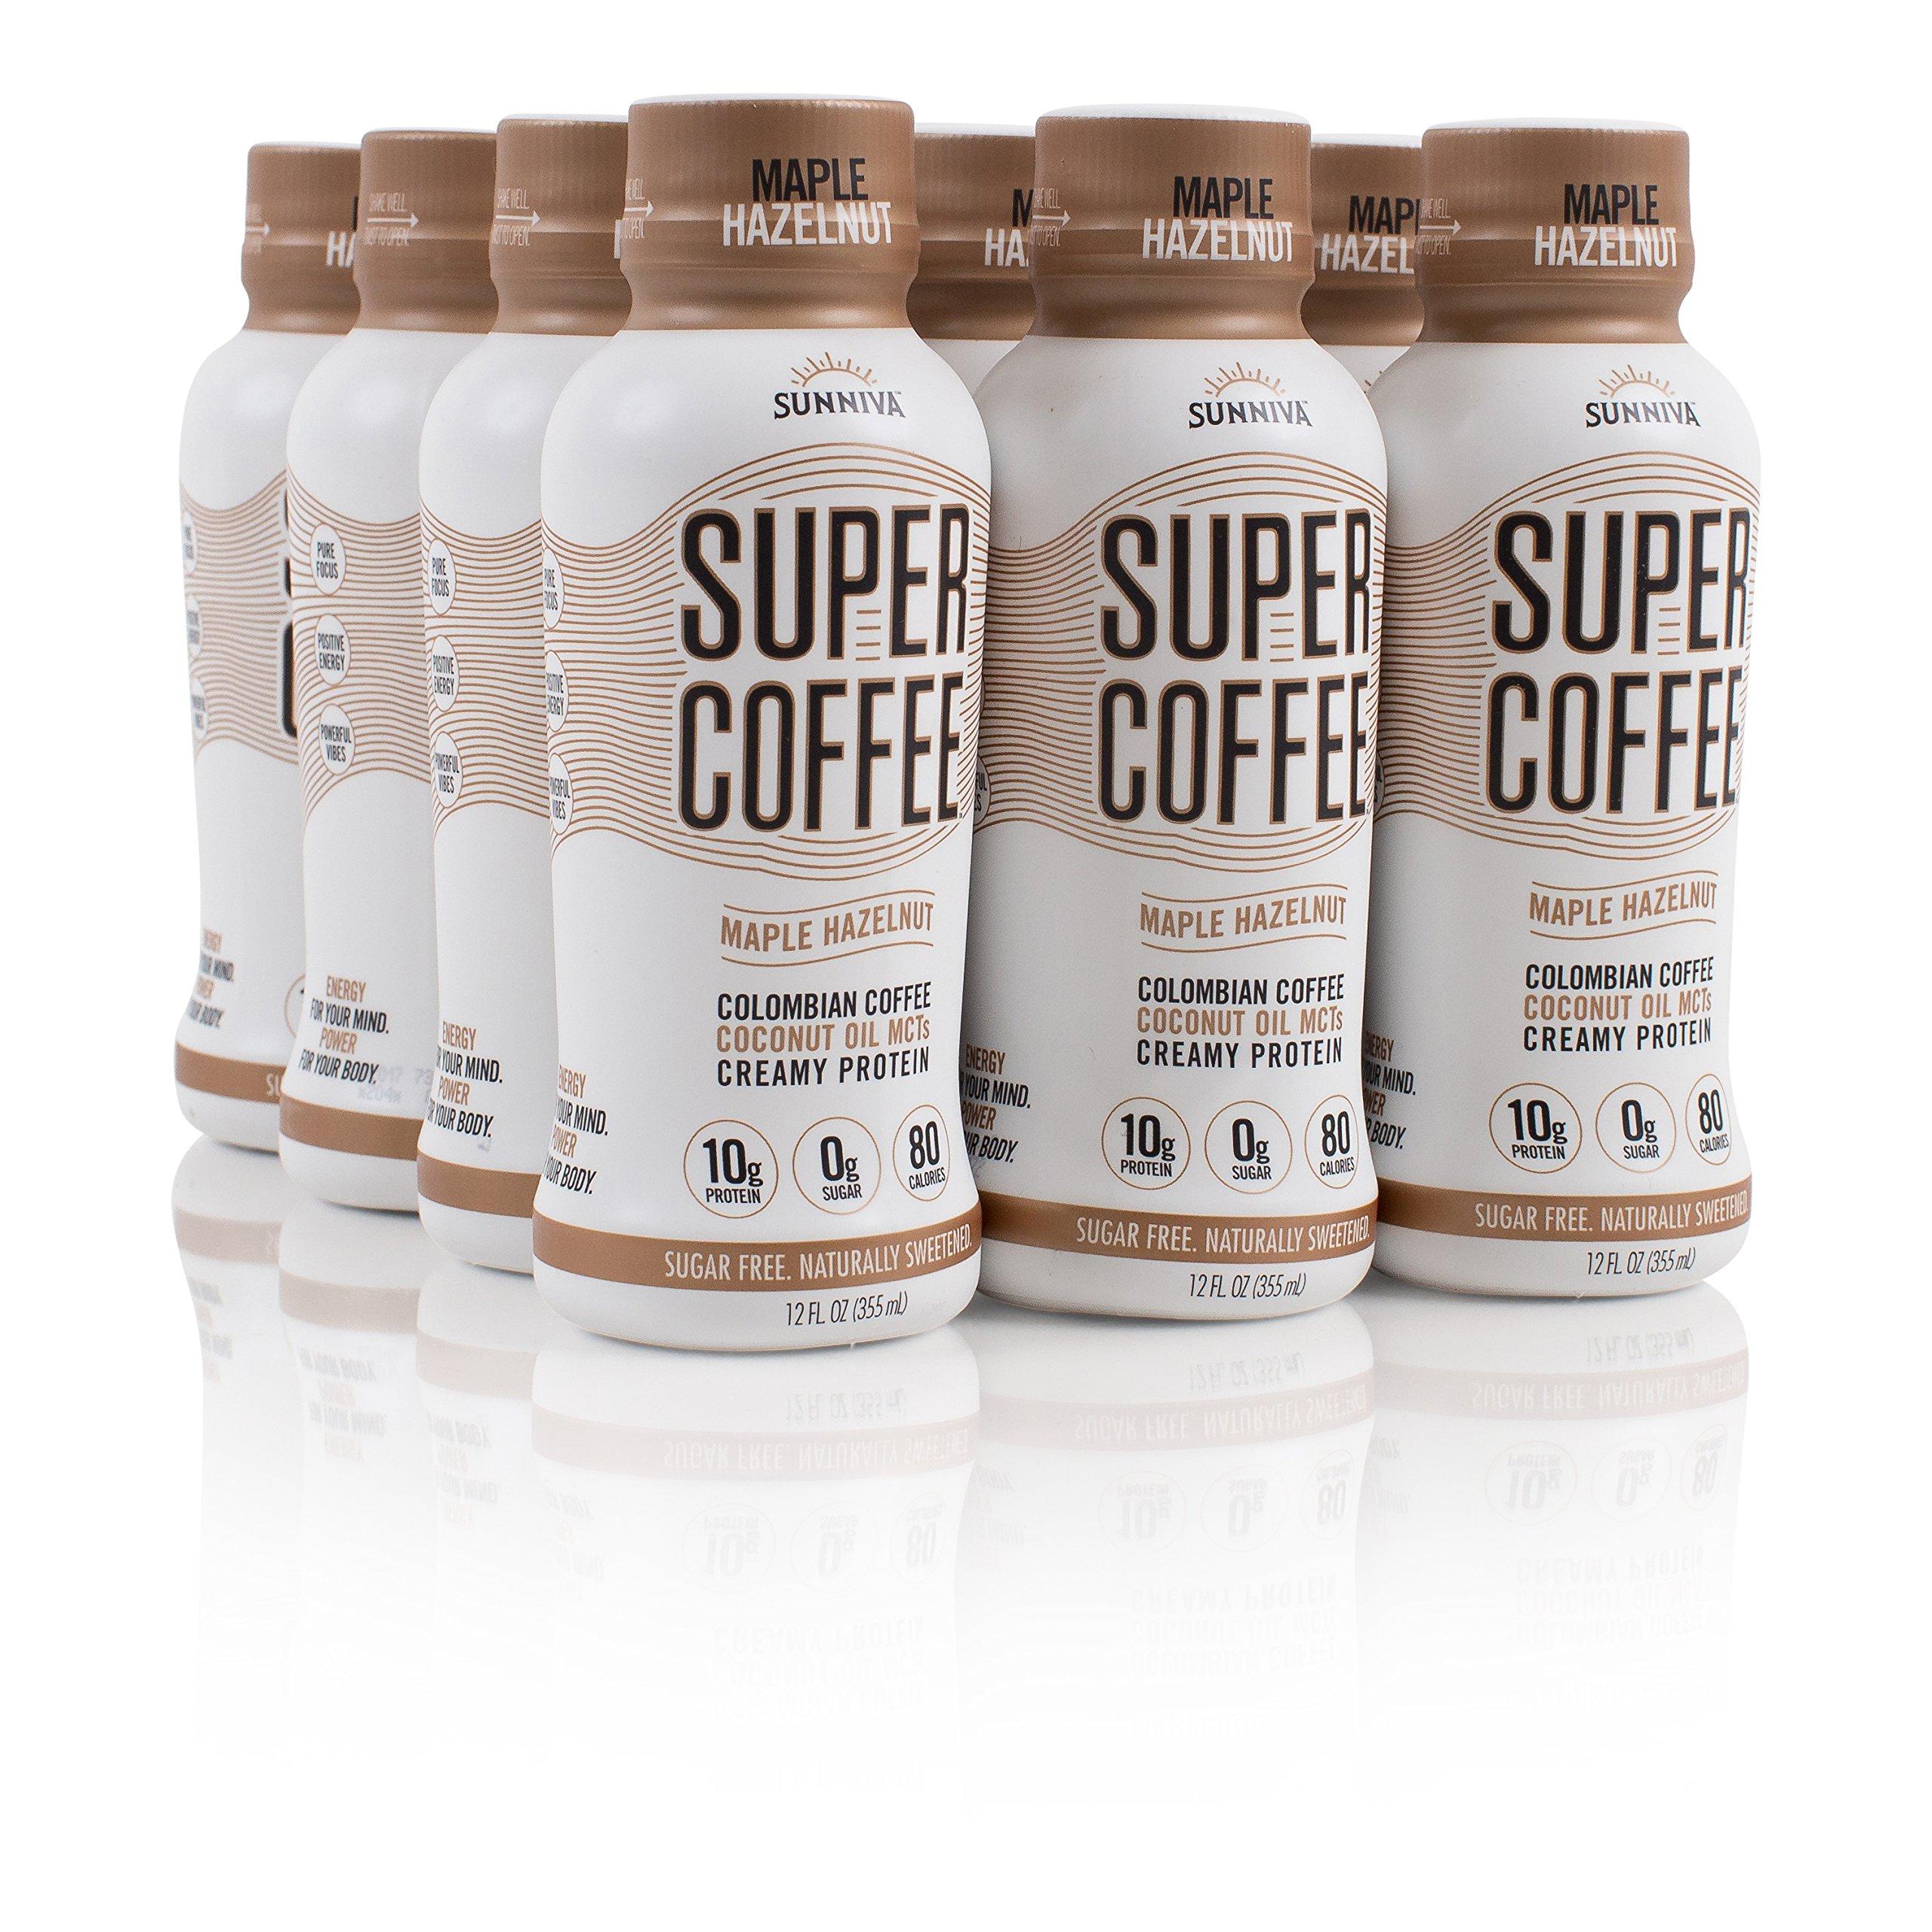 SUNNIVA Super Coffee Maple Hazelnut NEW Sugar-Free Formula, 10g Protein, Lactose Free, Soy Free, Gluten Free, Case of 12